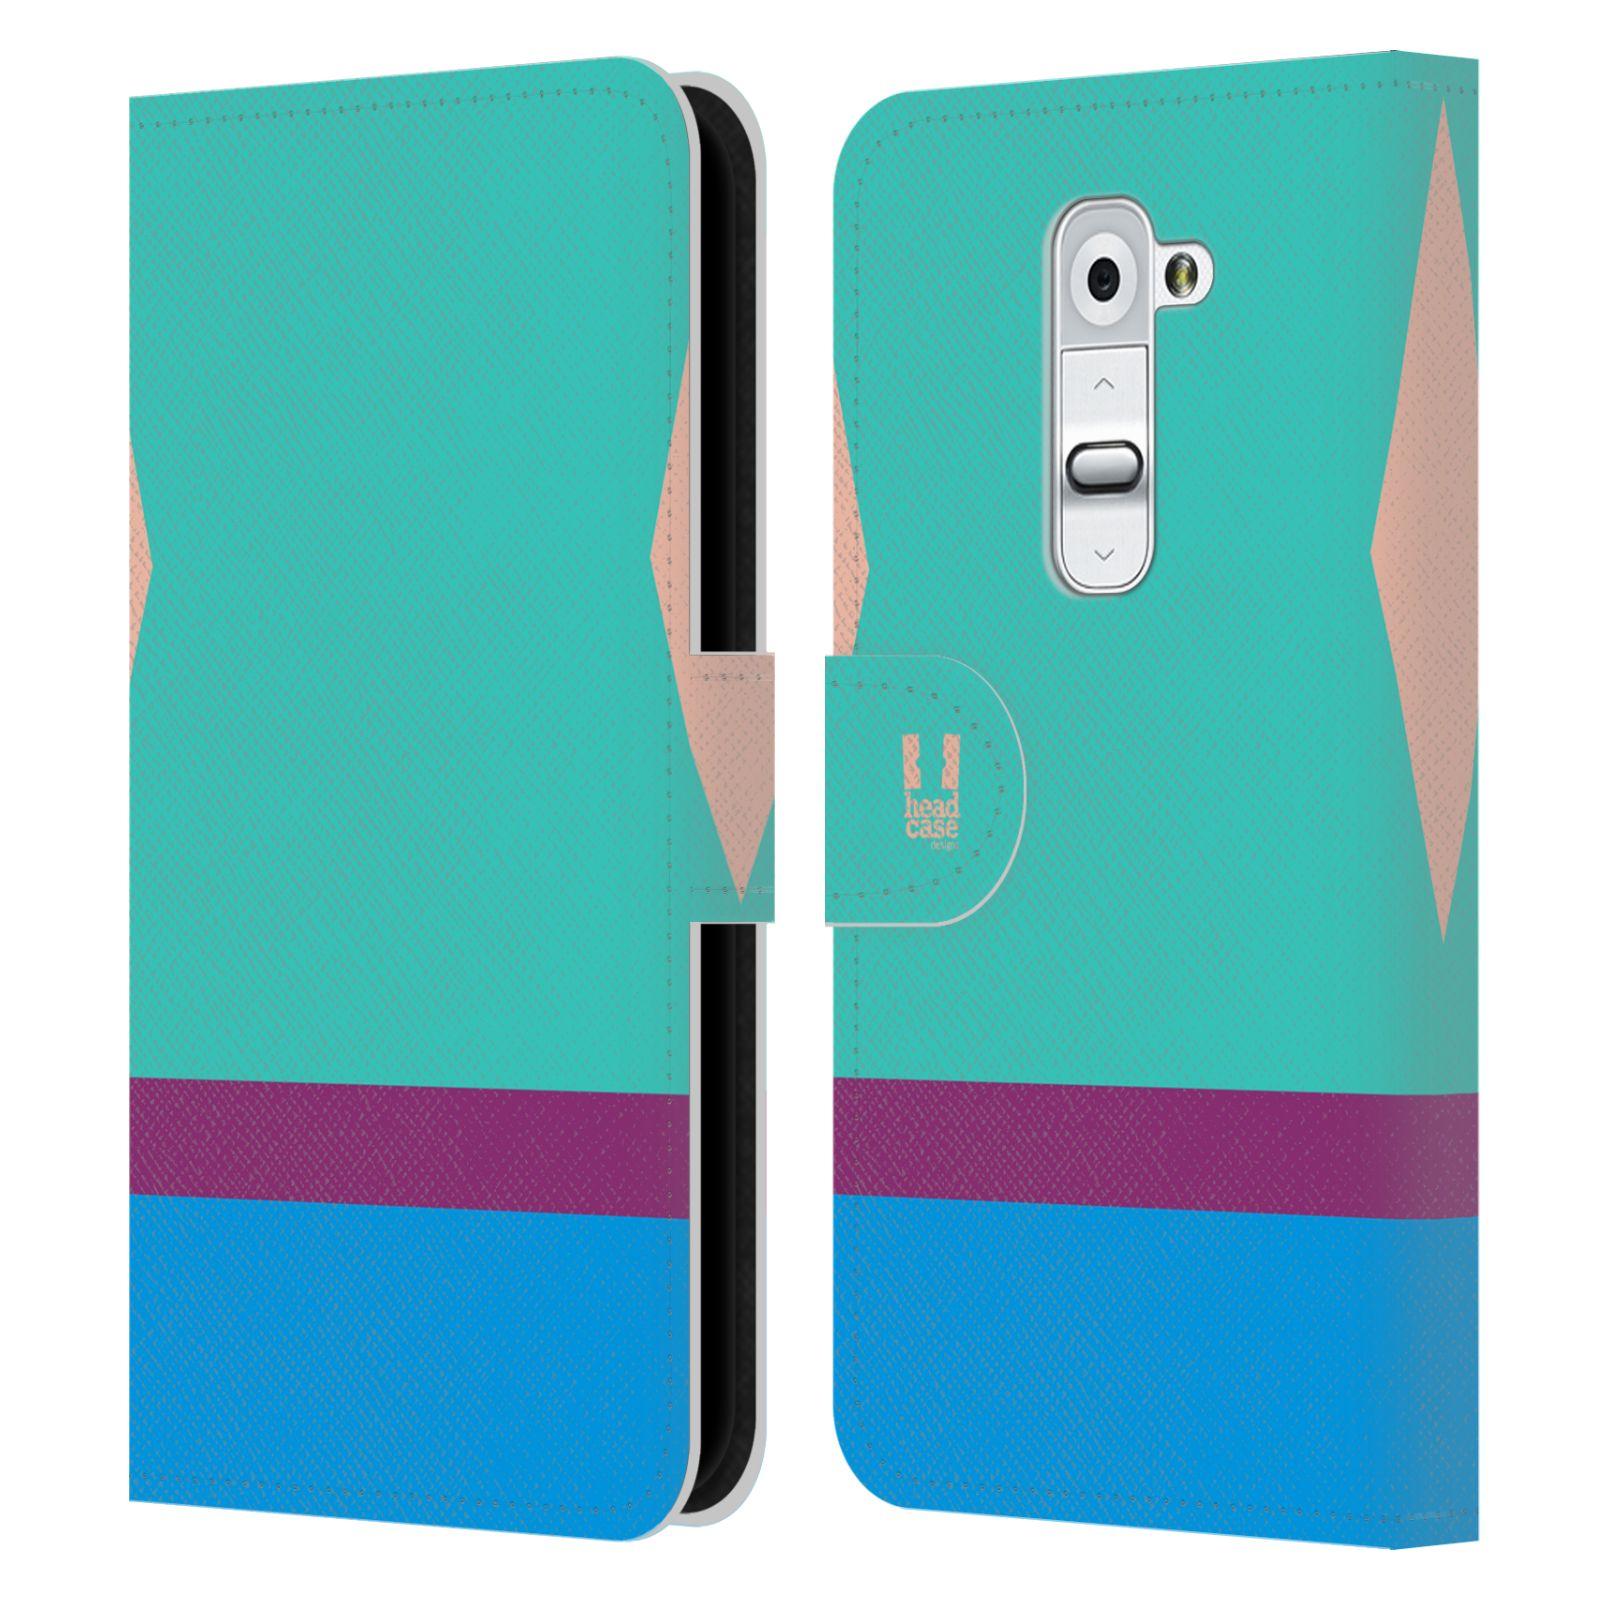 HEAD CASE Flipové pouzdro pro mobil LG G2 barevné tvary modrá a fialový pruh